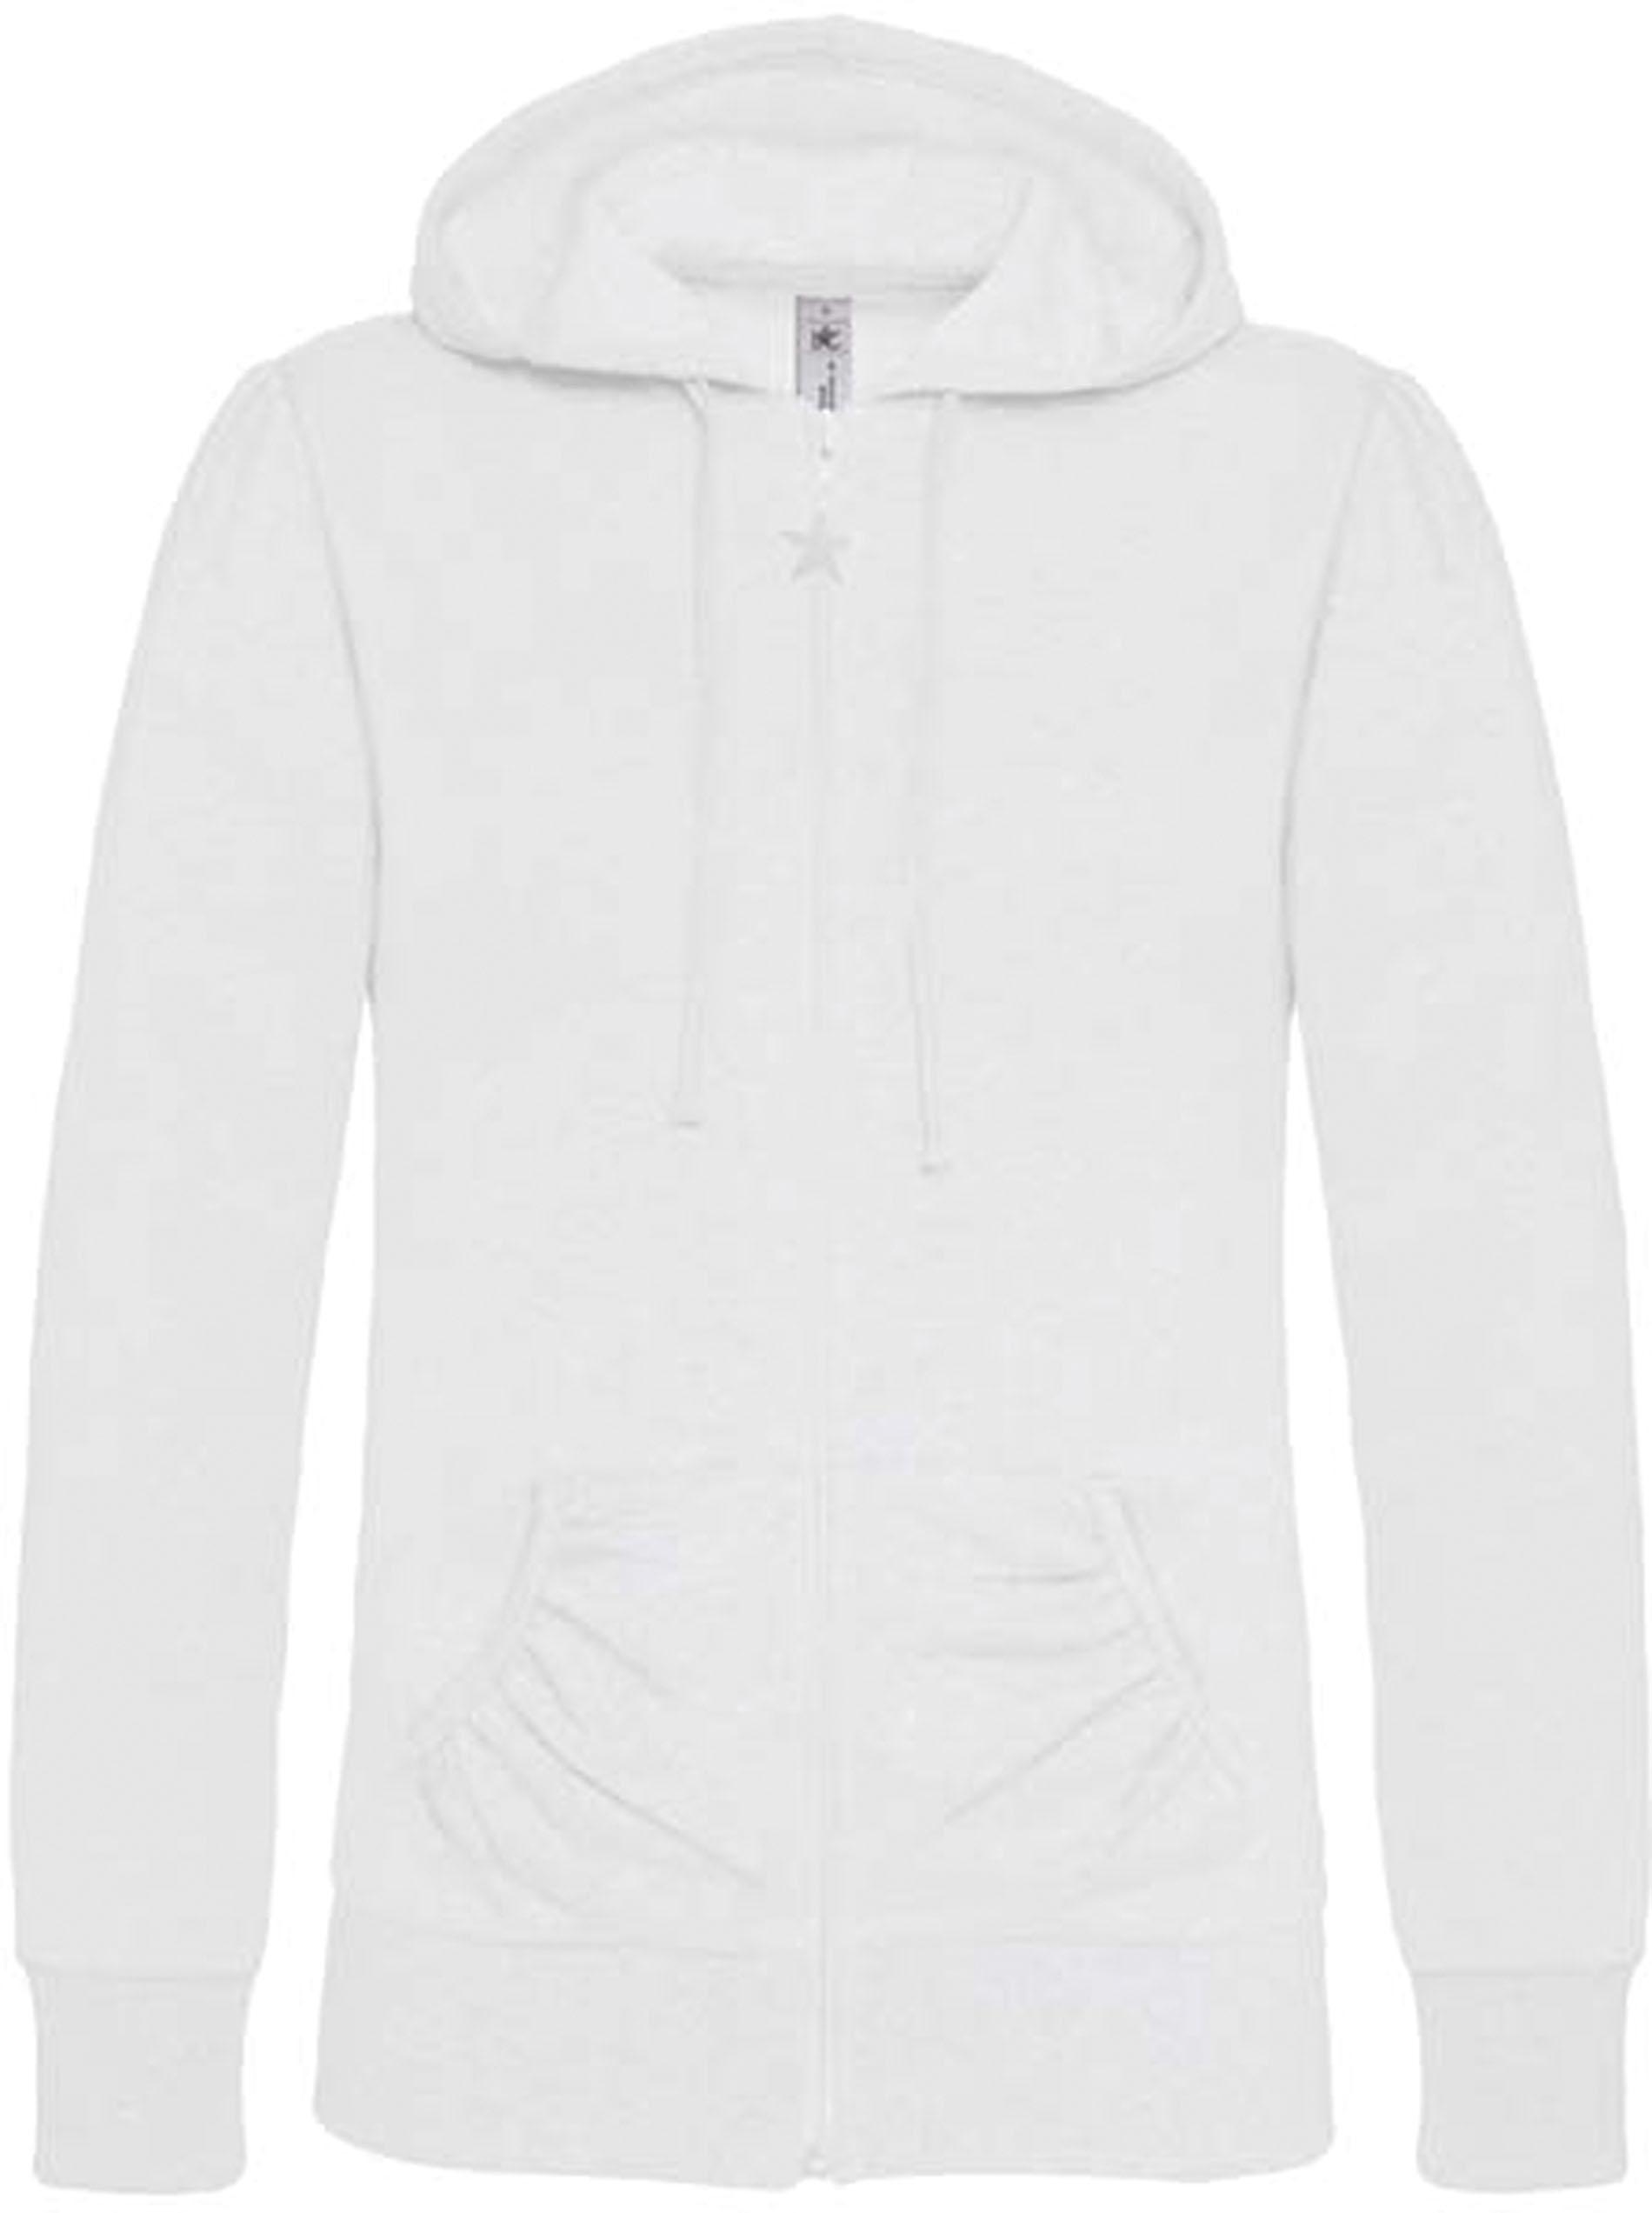 Gladiasport Shirt Wonder White Sweat Capuche Femme Zippé xYUUwIC6qd